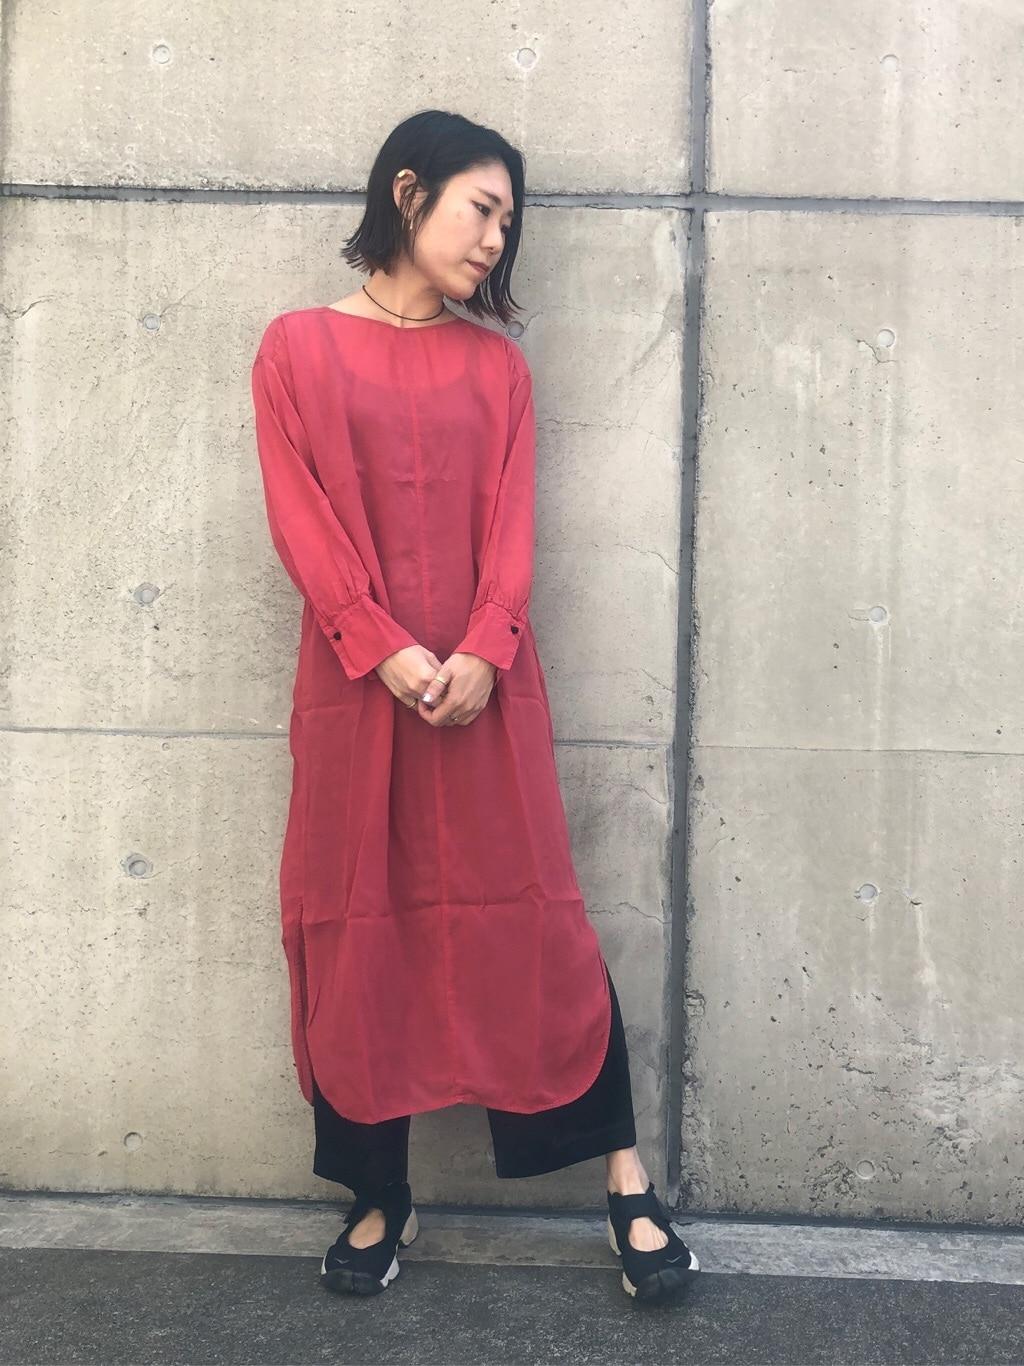 note et silence. ルミネ新宿 身長:169cm 2020.06.11